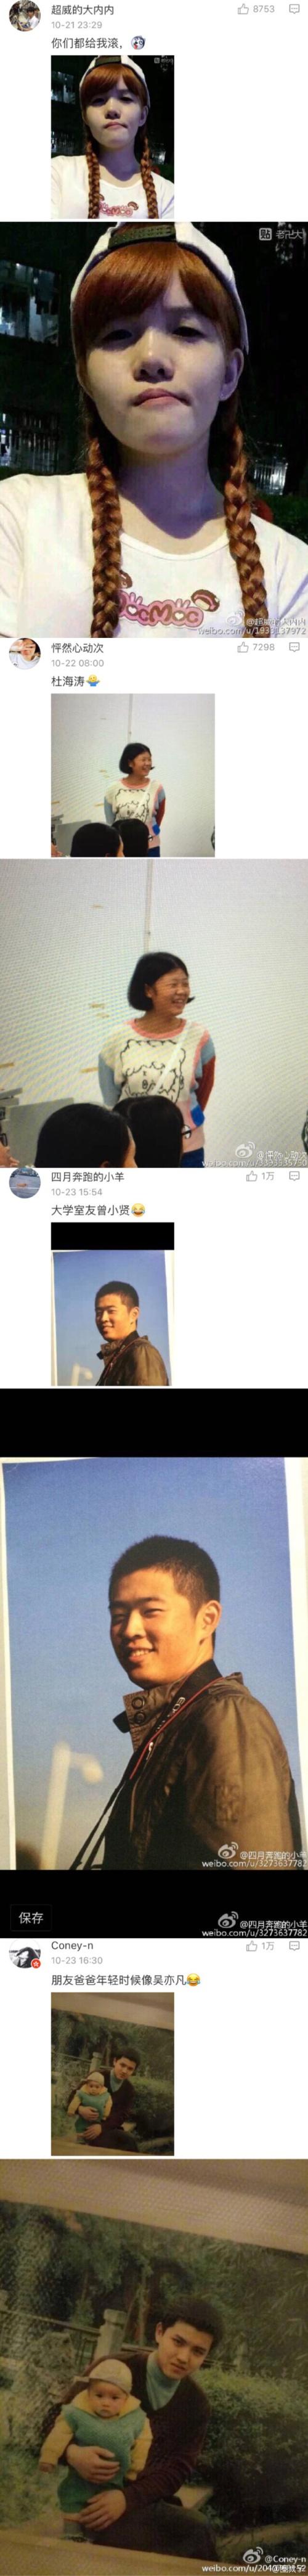 mingxing6